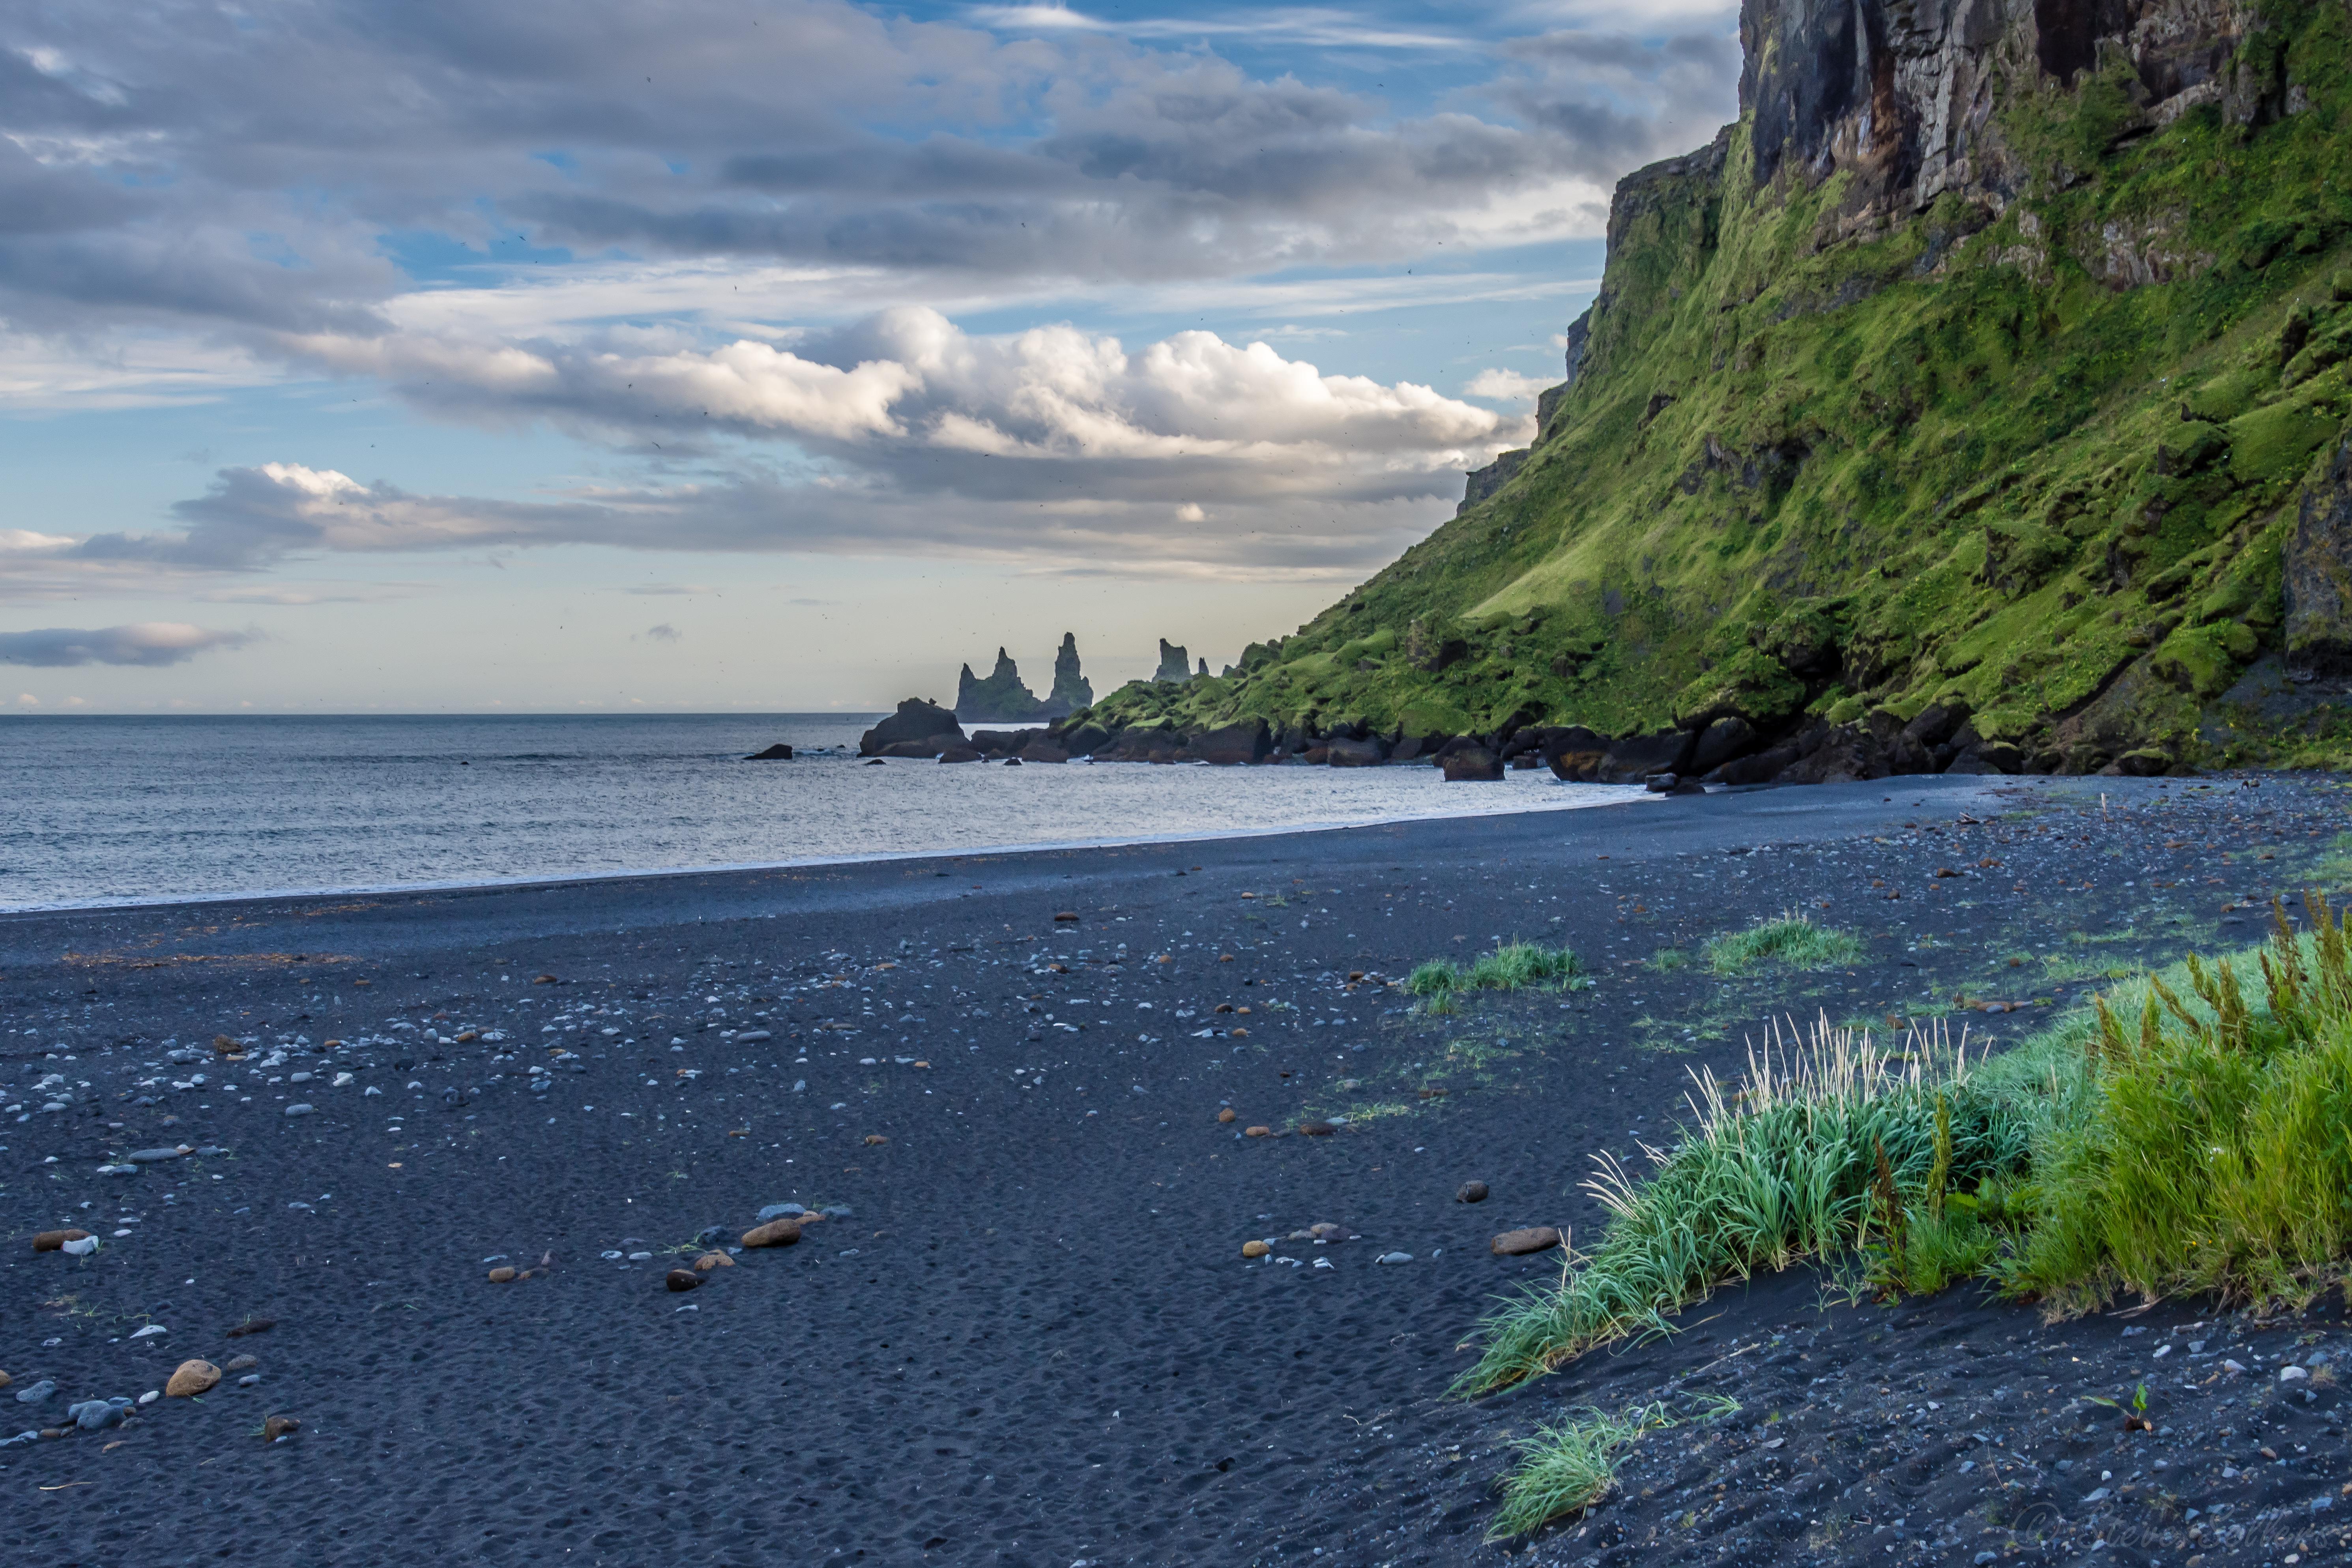 64282 descargar fondo de pantalla Playa, Paisaje, Naturaleza, Mar, Las Rocas, Rocas, Islandia: protectores de pantalla e imágenes gratis